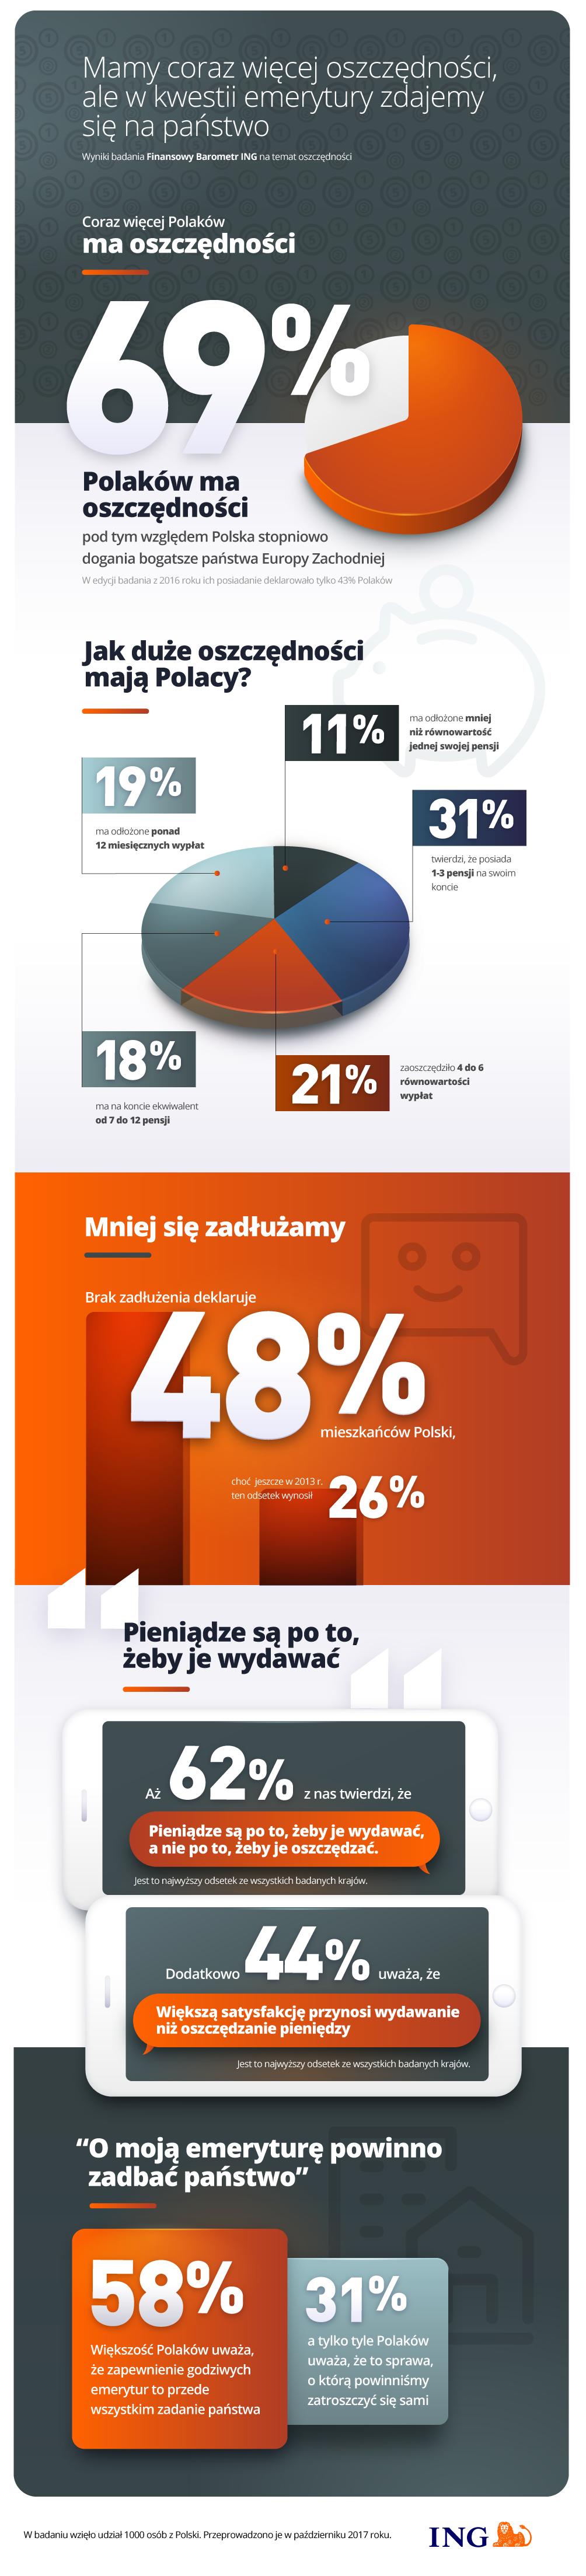 ING-infografika-oszczednosci.png